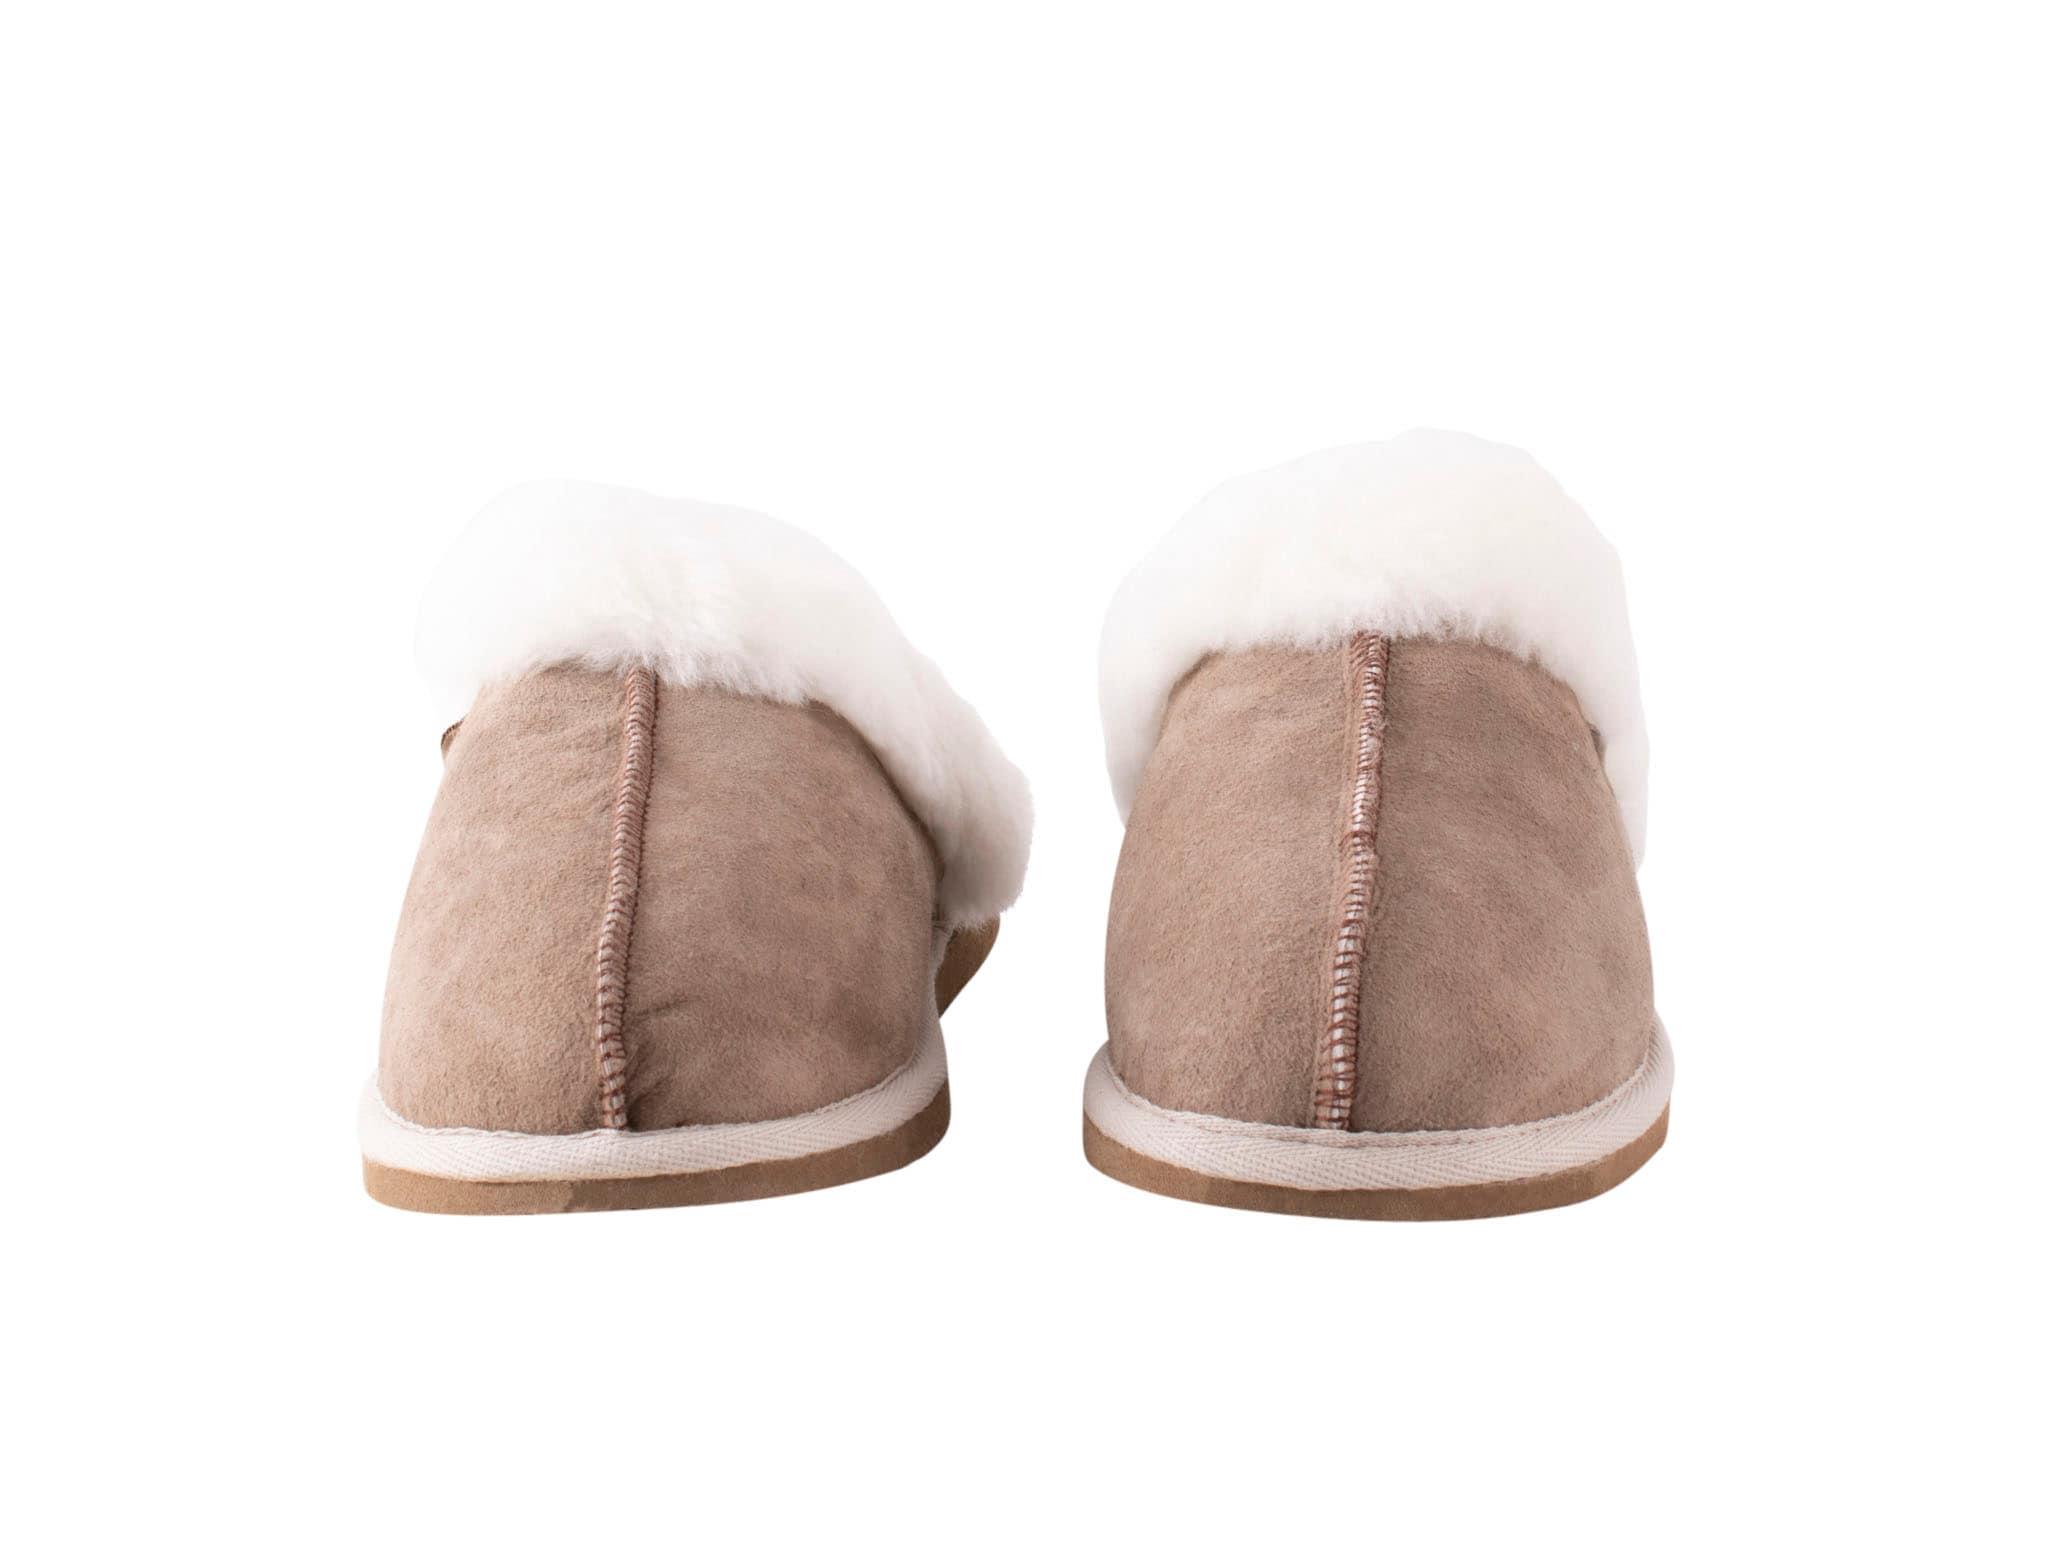 Jessica slippers